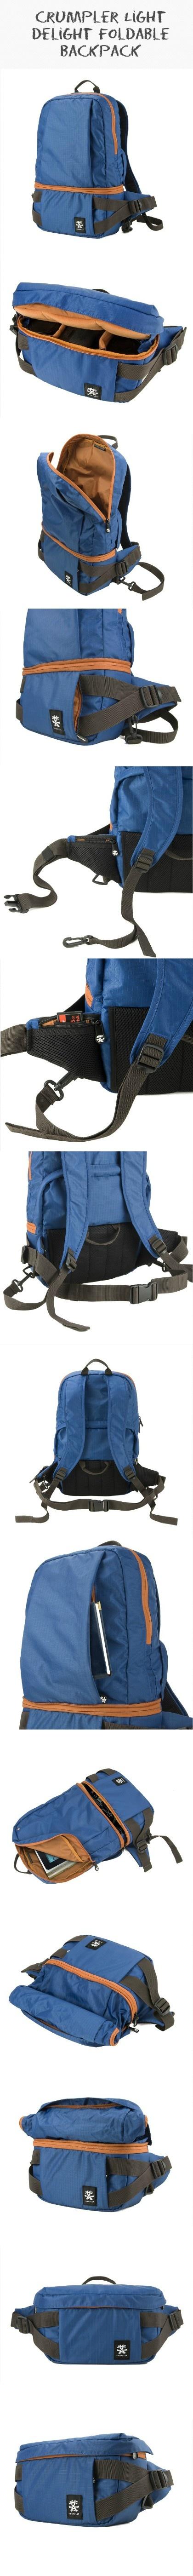 Light Delight Foldable Camera Backpack - #Crumpler #Camera_Backpack http://crumpler.eu/index.cfm?seite=photo=EN=8318